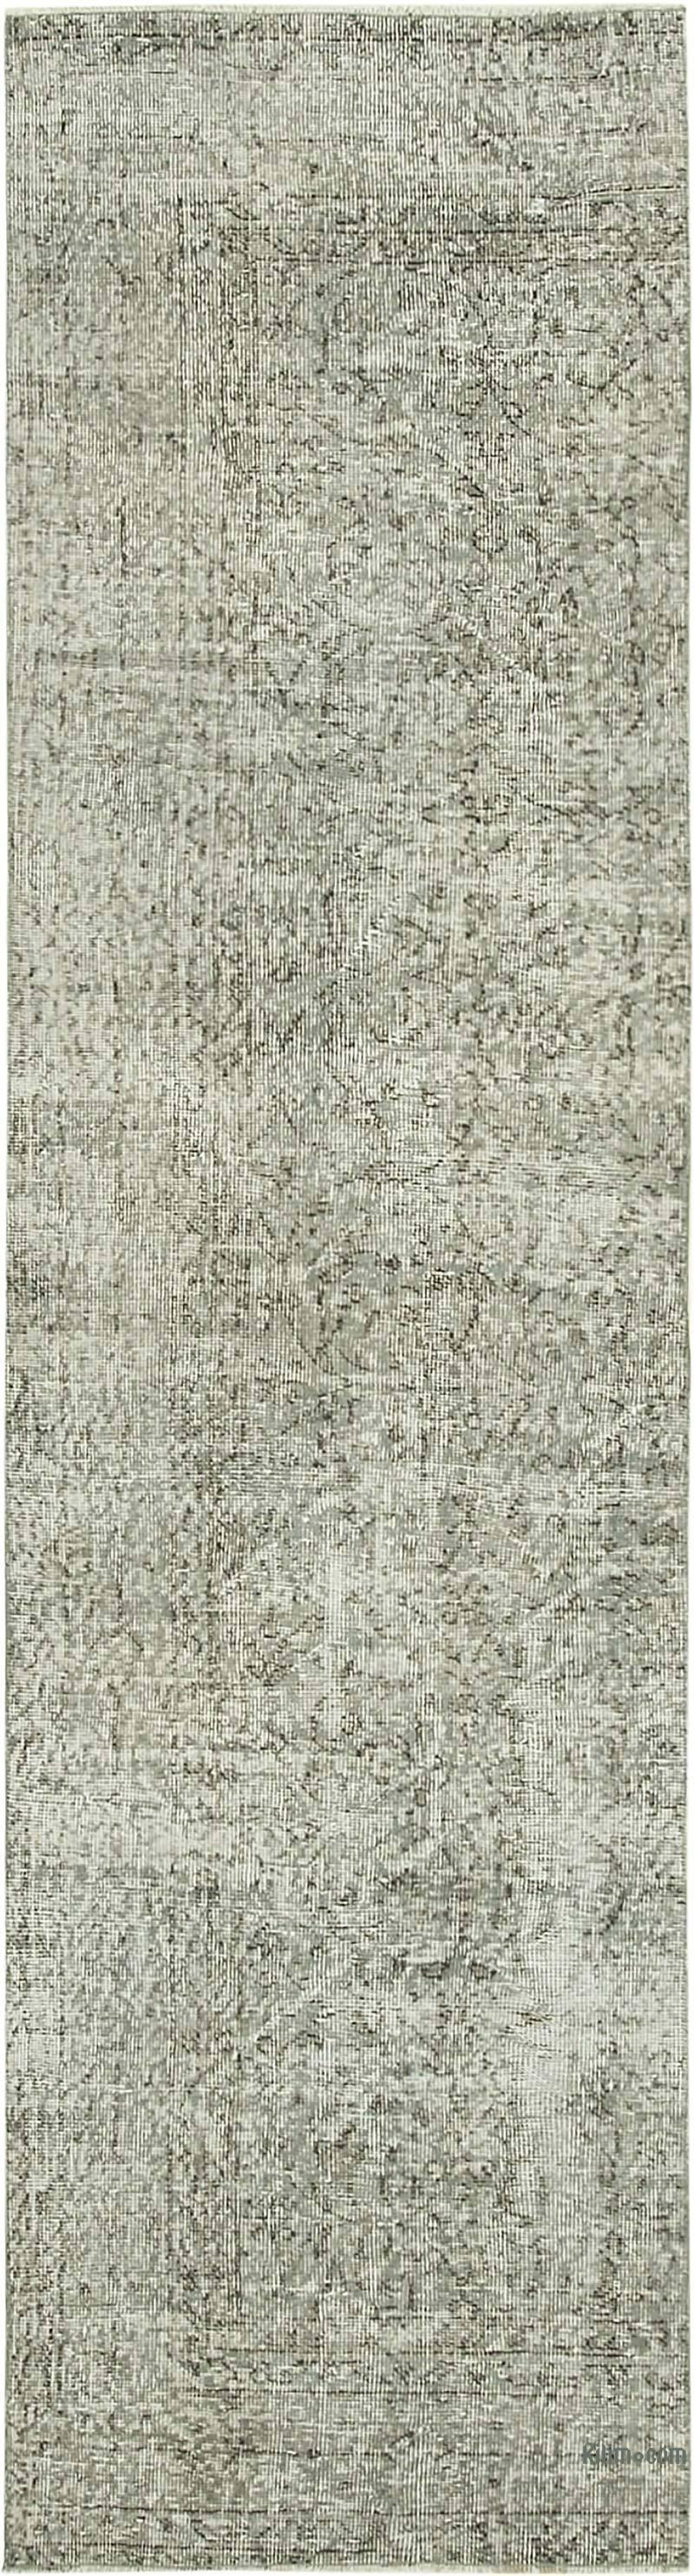 Grey Over-dyed Turkish Vintage Runner Rug - 2' 8# x 9' 9# (32 in. x 117 in.) - K0054572